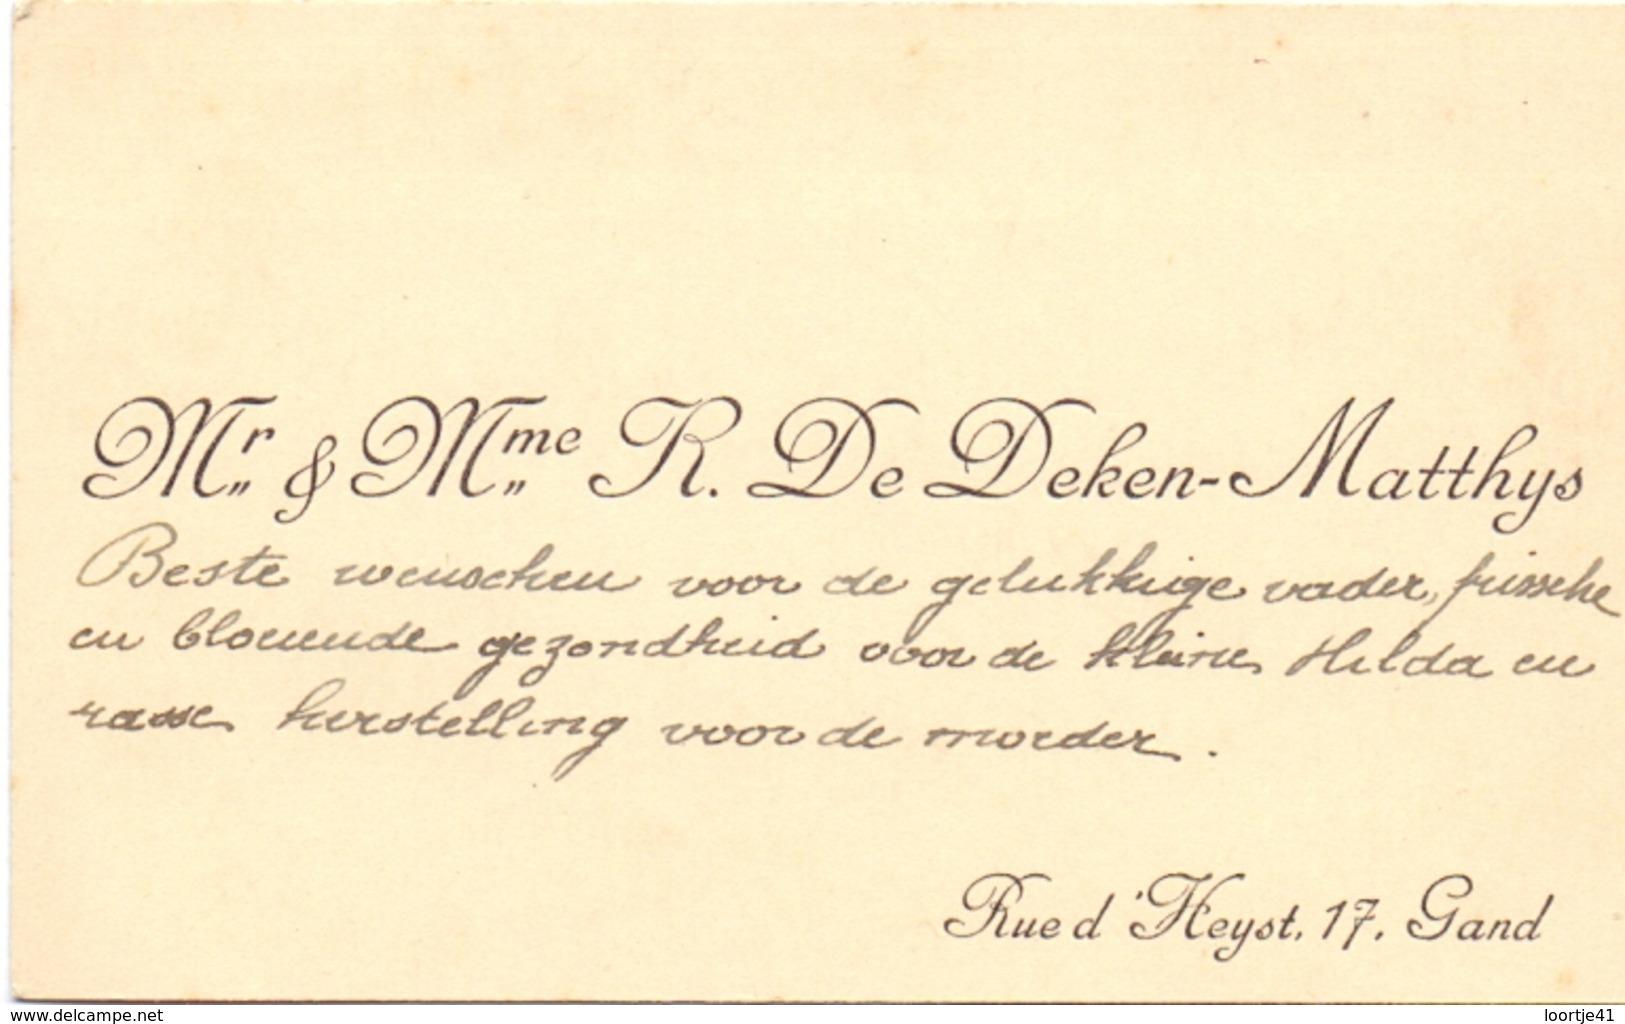 Visitekaartje - Carte Visite - Mr & Mme R. De Deken - Matthys - Gand Gent - Cartes De Visite